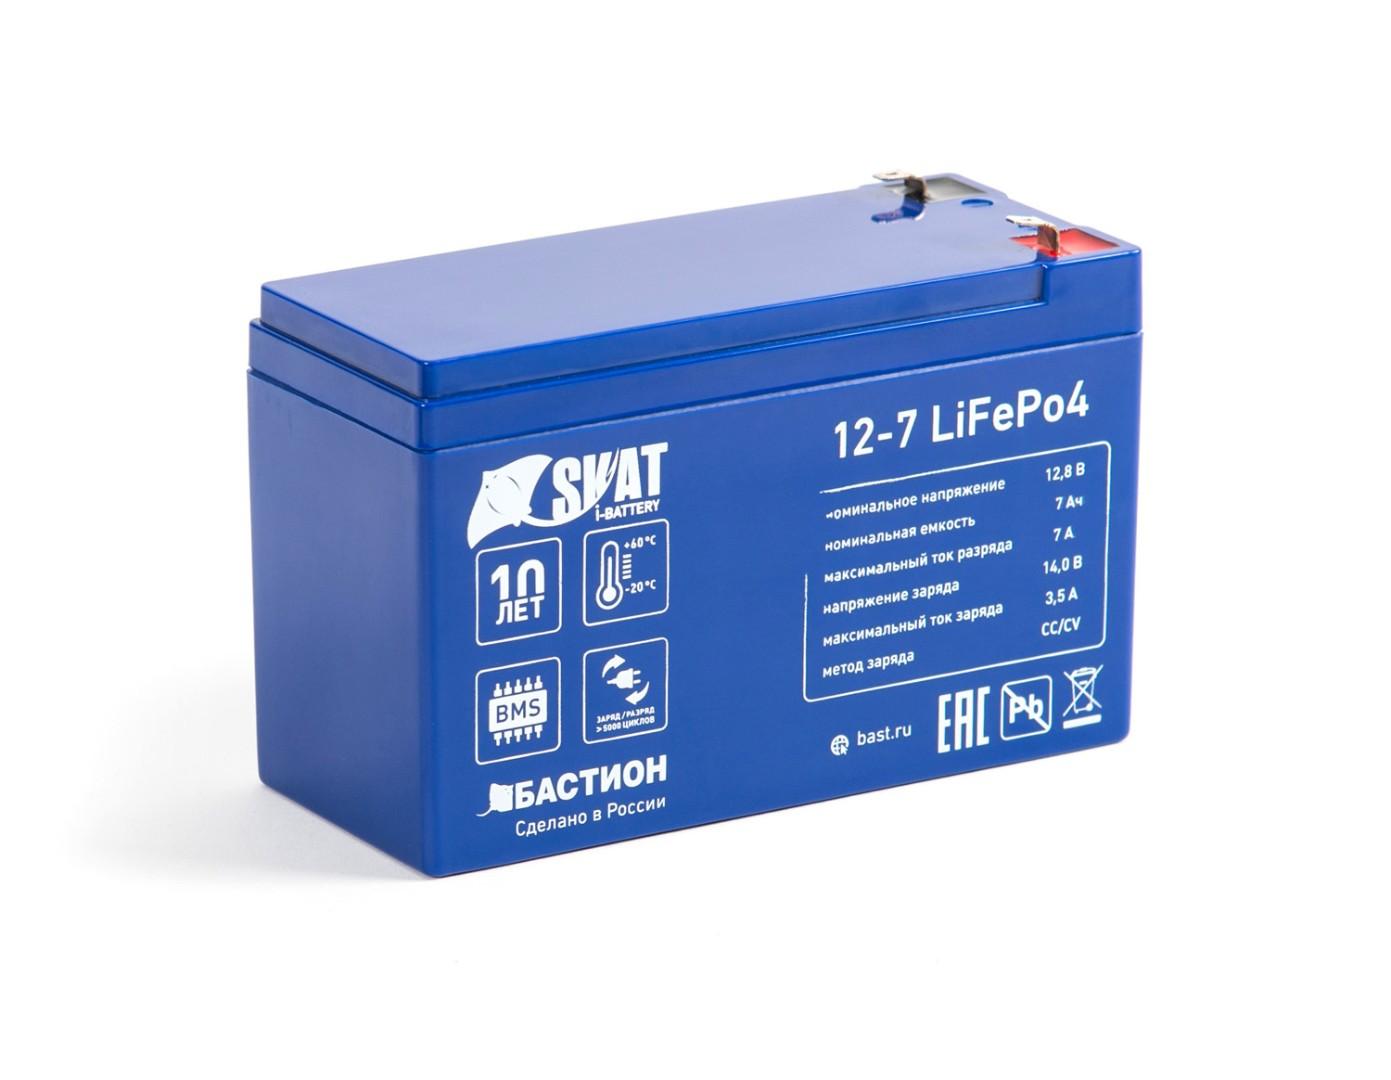 Аккумулятор Skat i-Battery 12-7 LiFePo4